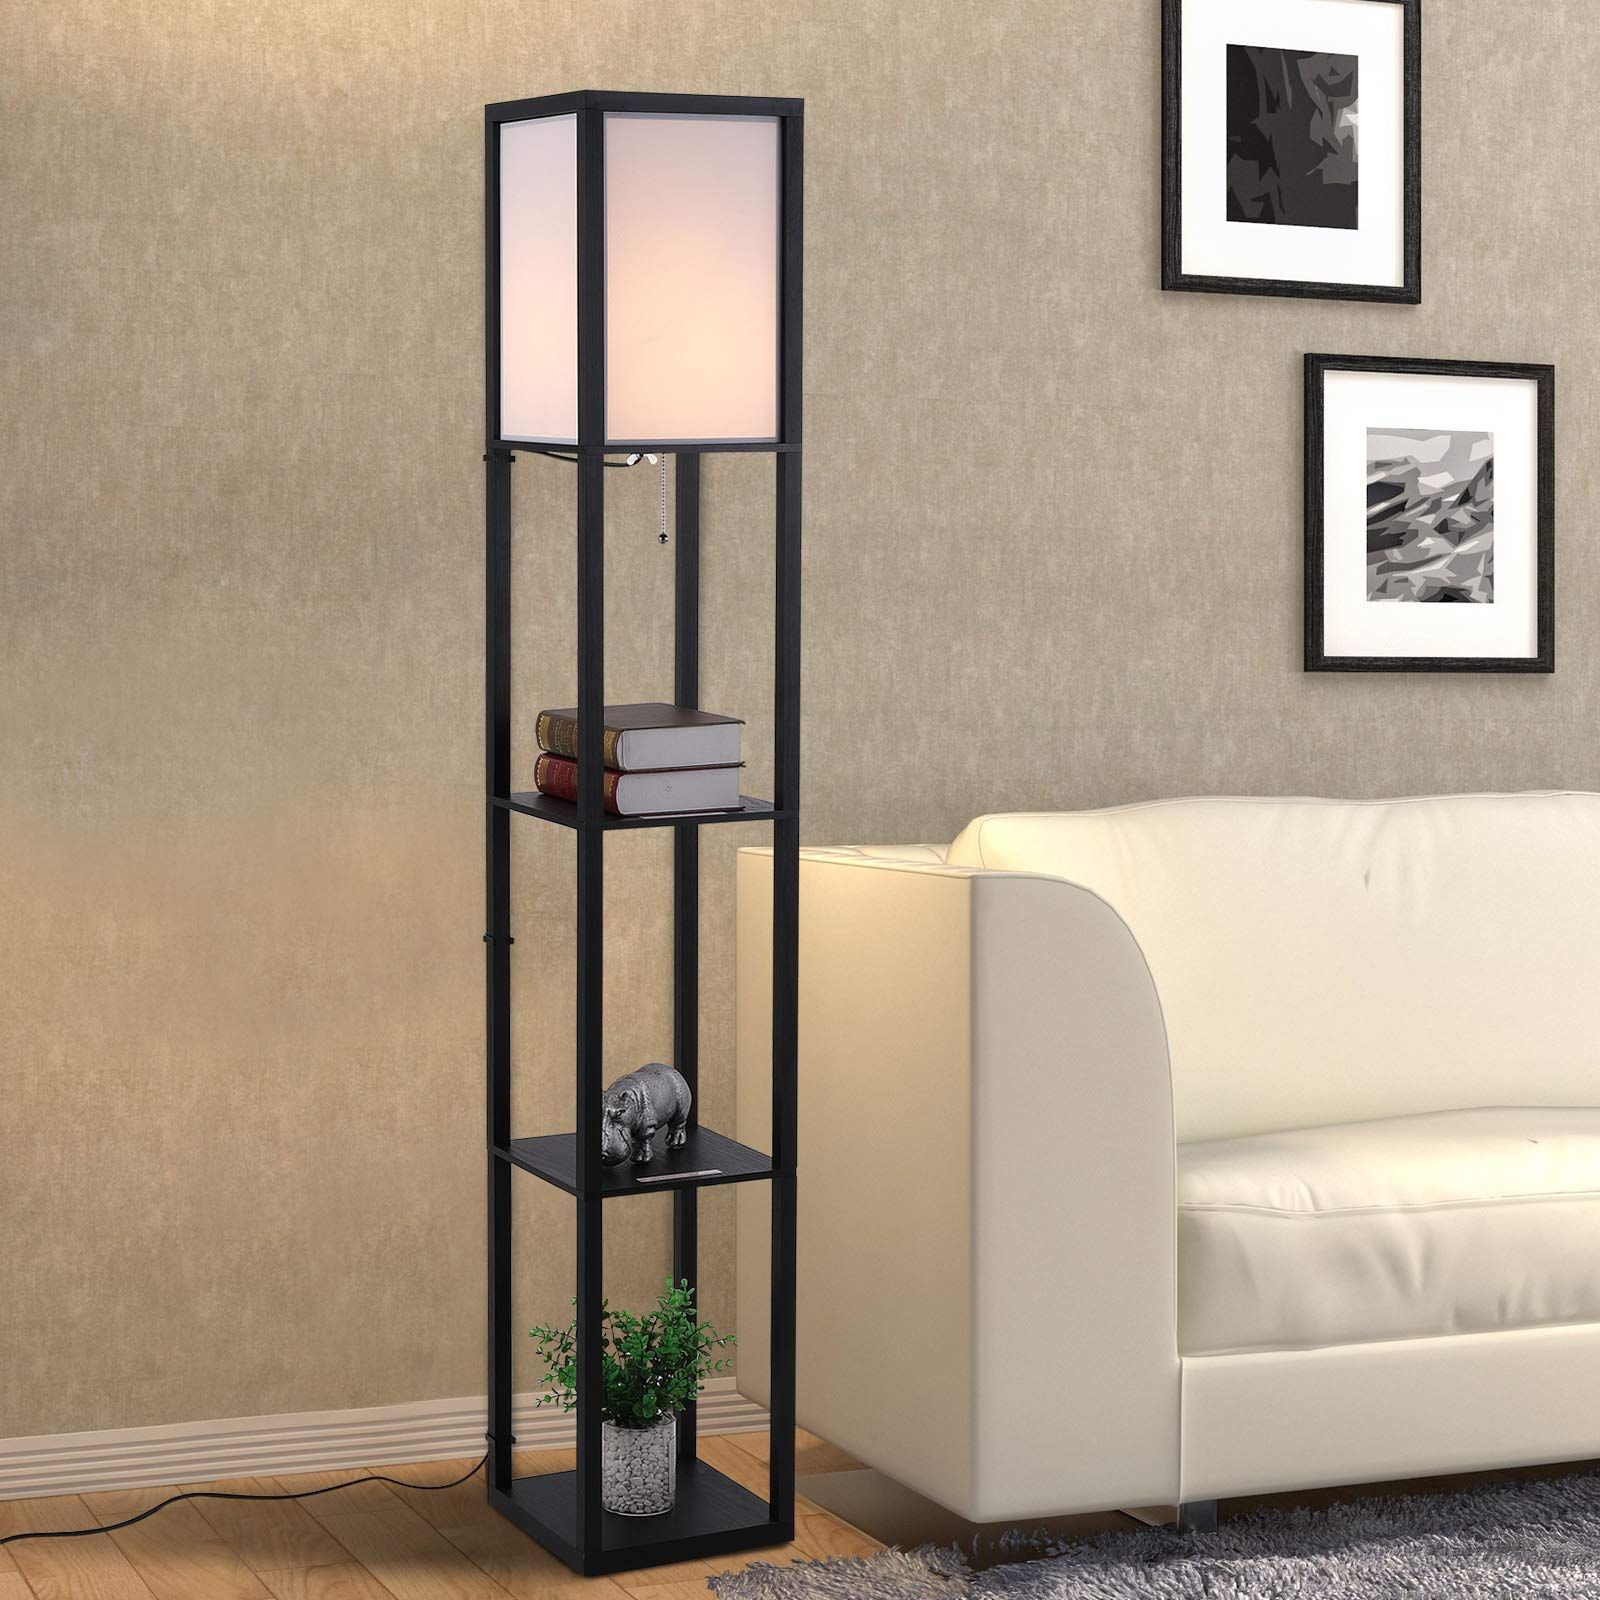 Homcom Modern Shelf Floor Lamp Soft Light 4 Tier Open Shelves Living Room Storage Display Amazon Co Uk K In 2020 Floor Lamp With Shelves Cheap Floor Lamps Floor Lamp